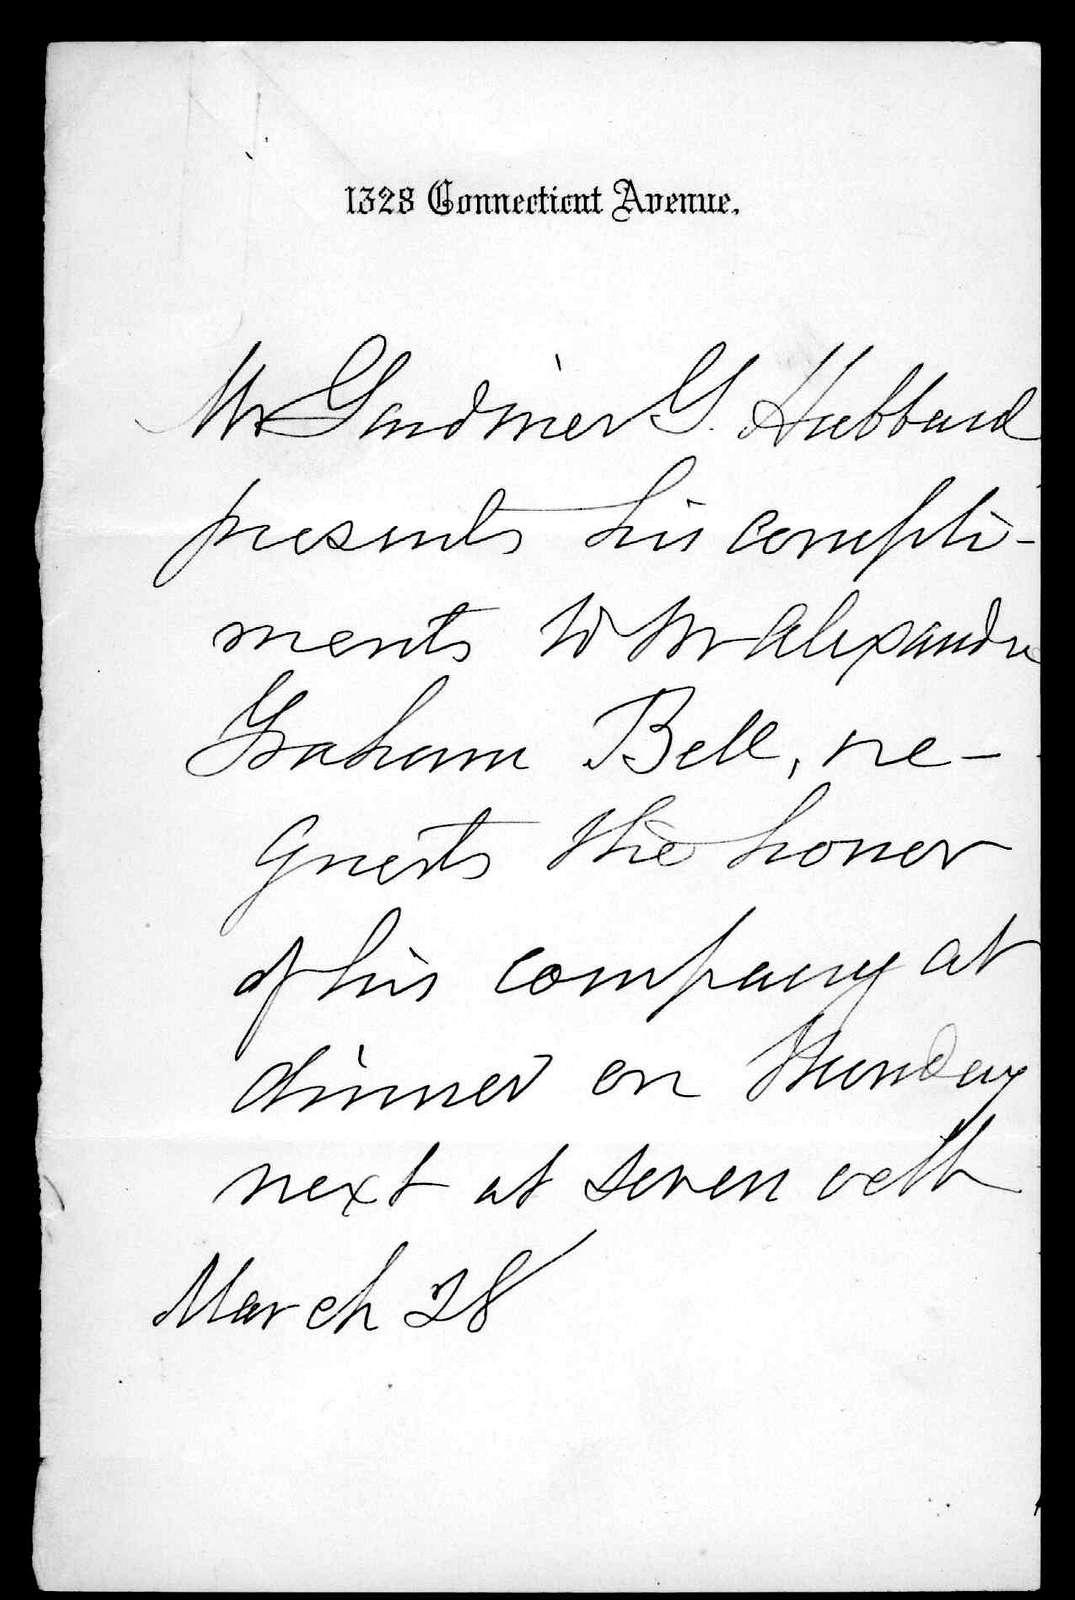 Gardiner Greene Hubbard to Alexander Graham Bell, March 28, 1884